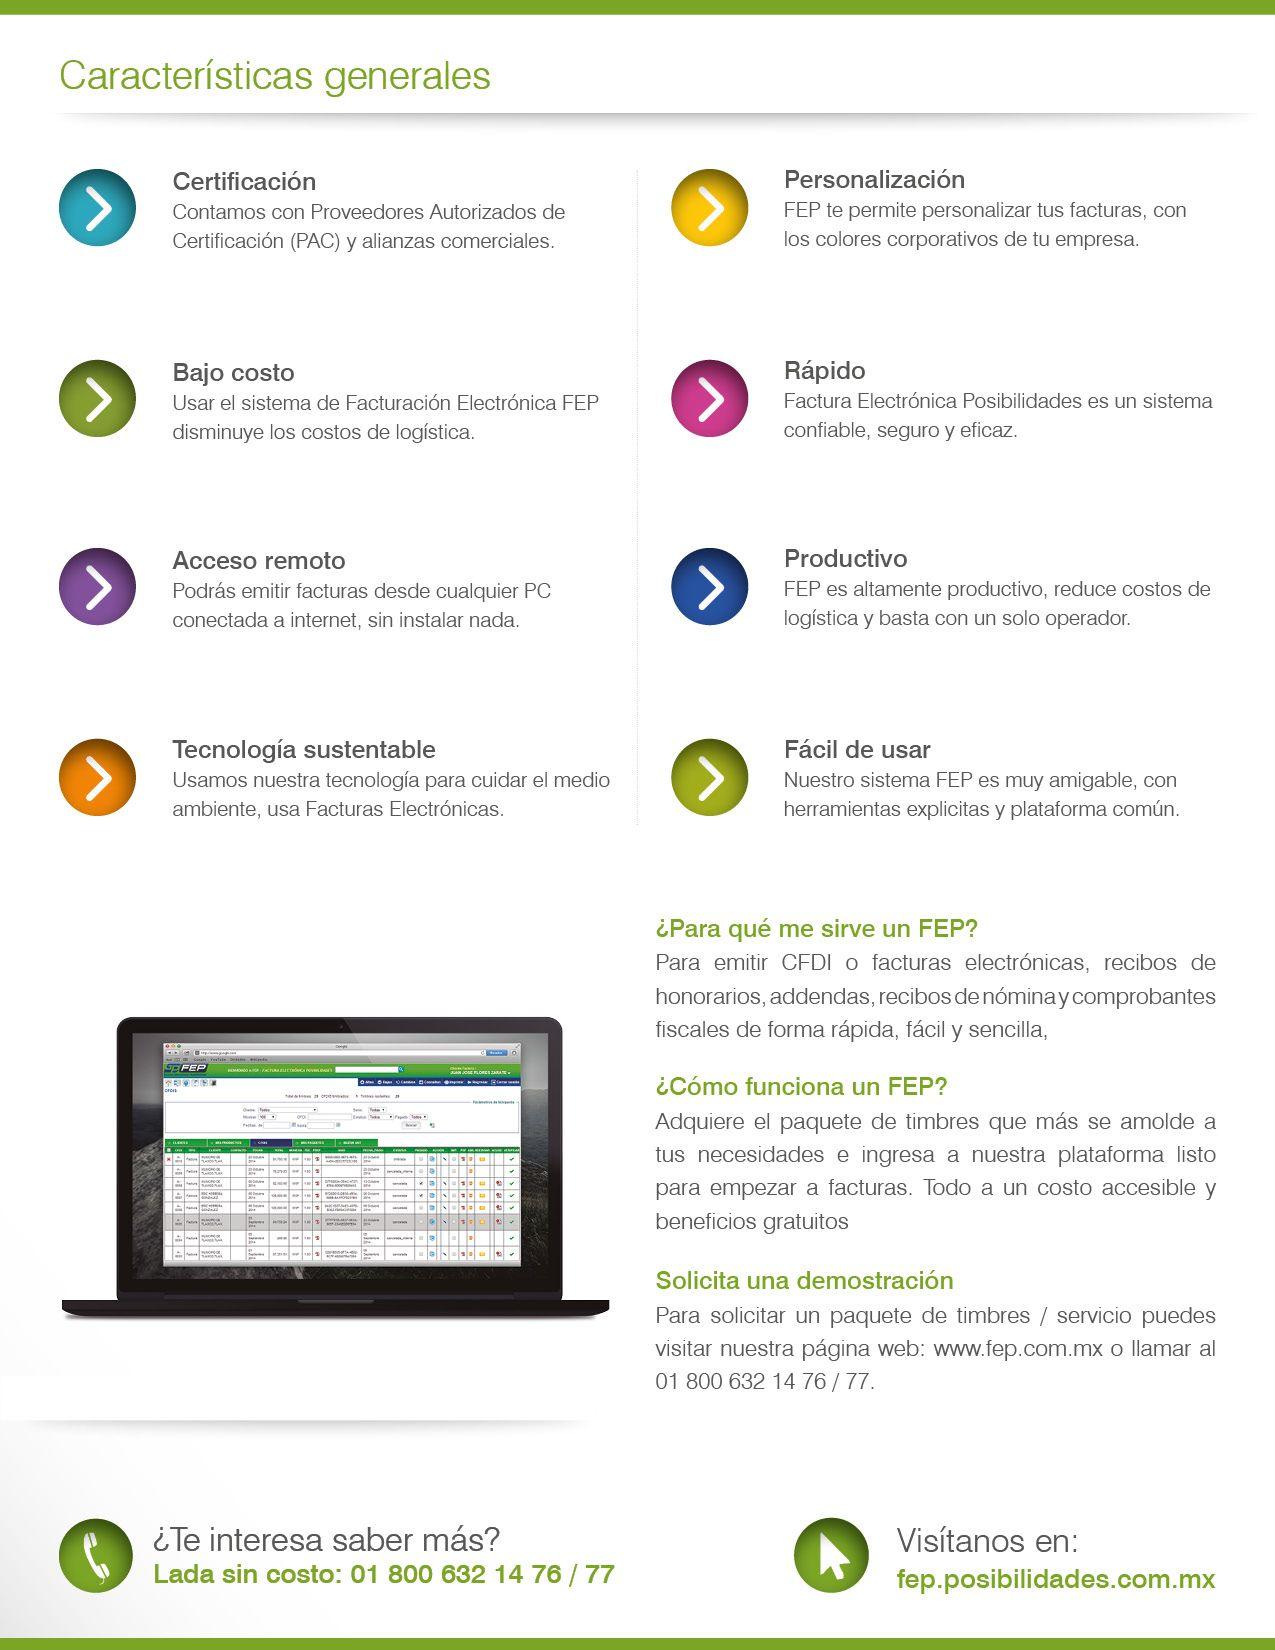 FEP-m Factura Electrónica Posibilidades Multiempresa PDF: http://bit ...